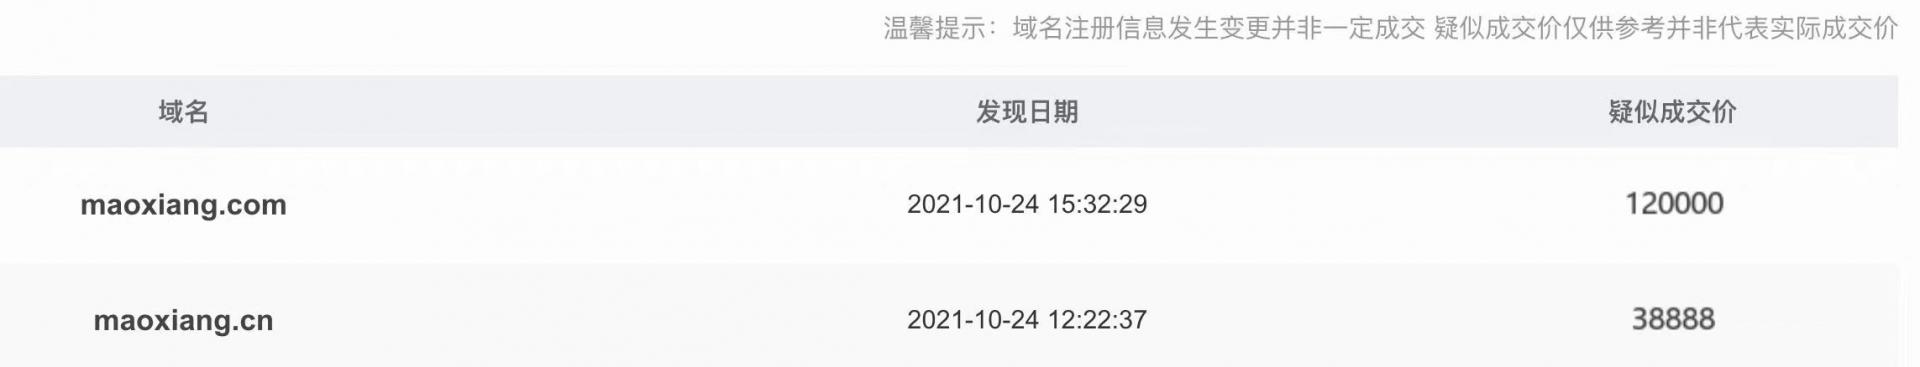 阿里巴巴斥资近16万元收购域名Maoxiang.com、Maoxiang.cn